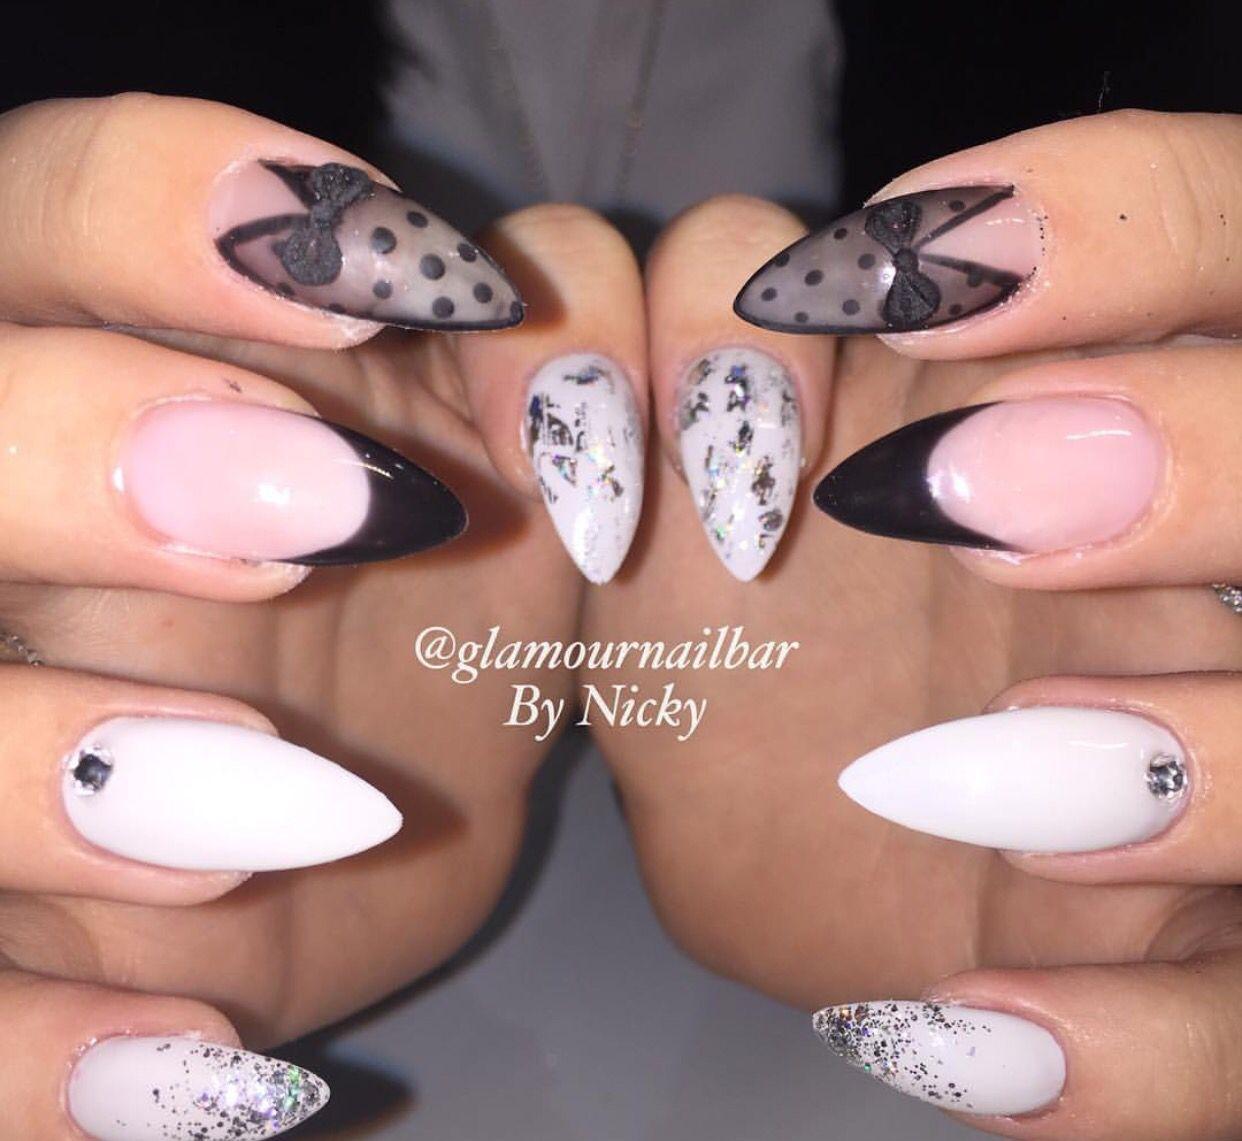 Almond nails, matte, 3D bows, silver foil, polka dots, glitter fade ...